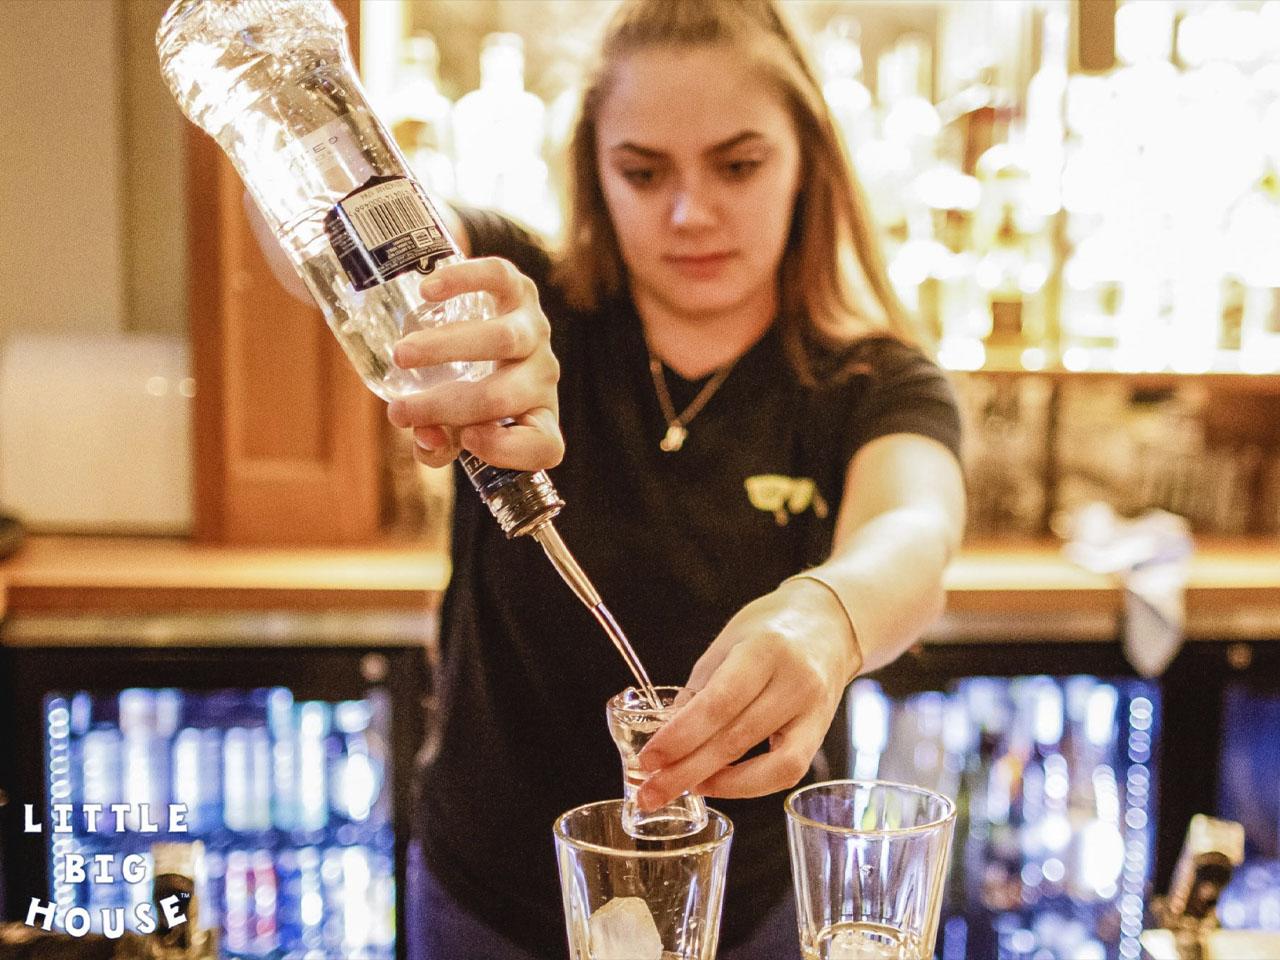 Bar girl pouring spirits into small glass at bar